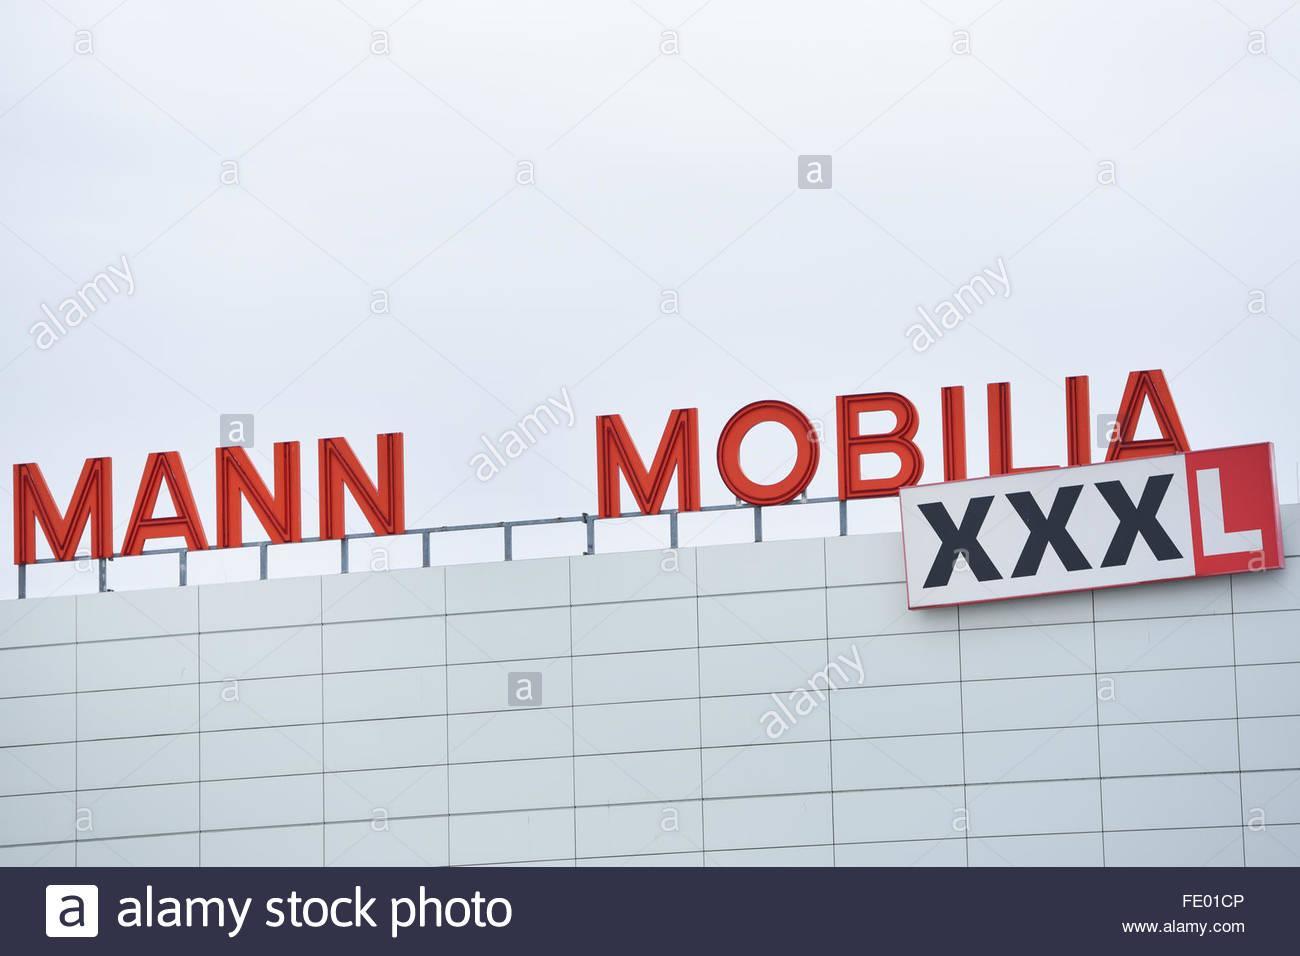 Xxl Mann Mobilia Mannheim